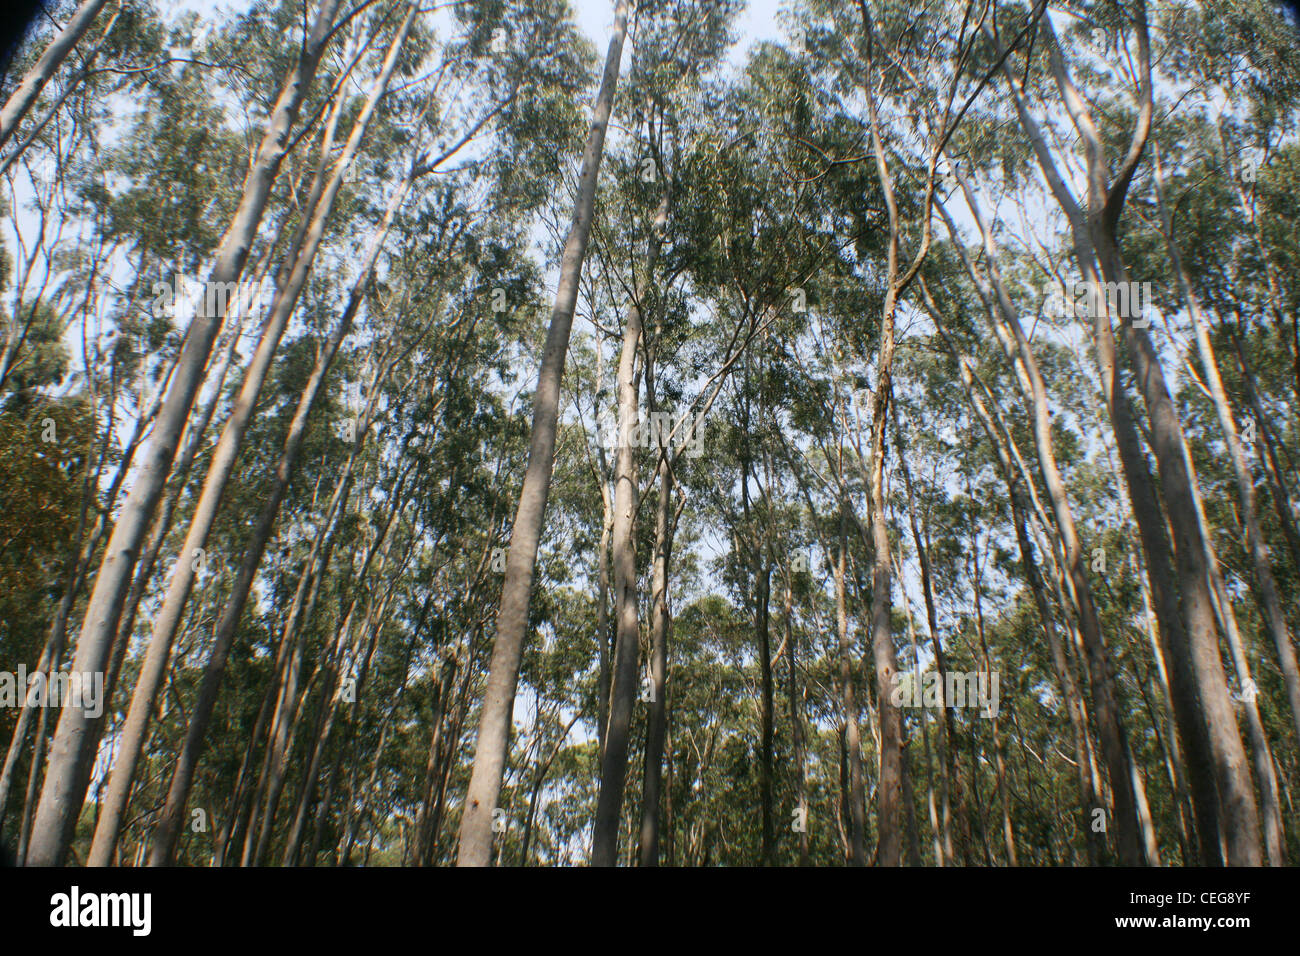 Eucalyptus forest - Stock Image